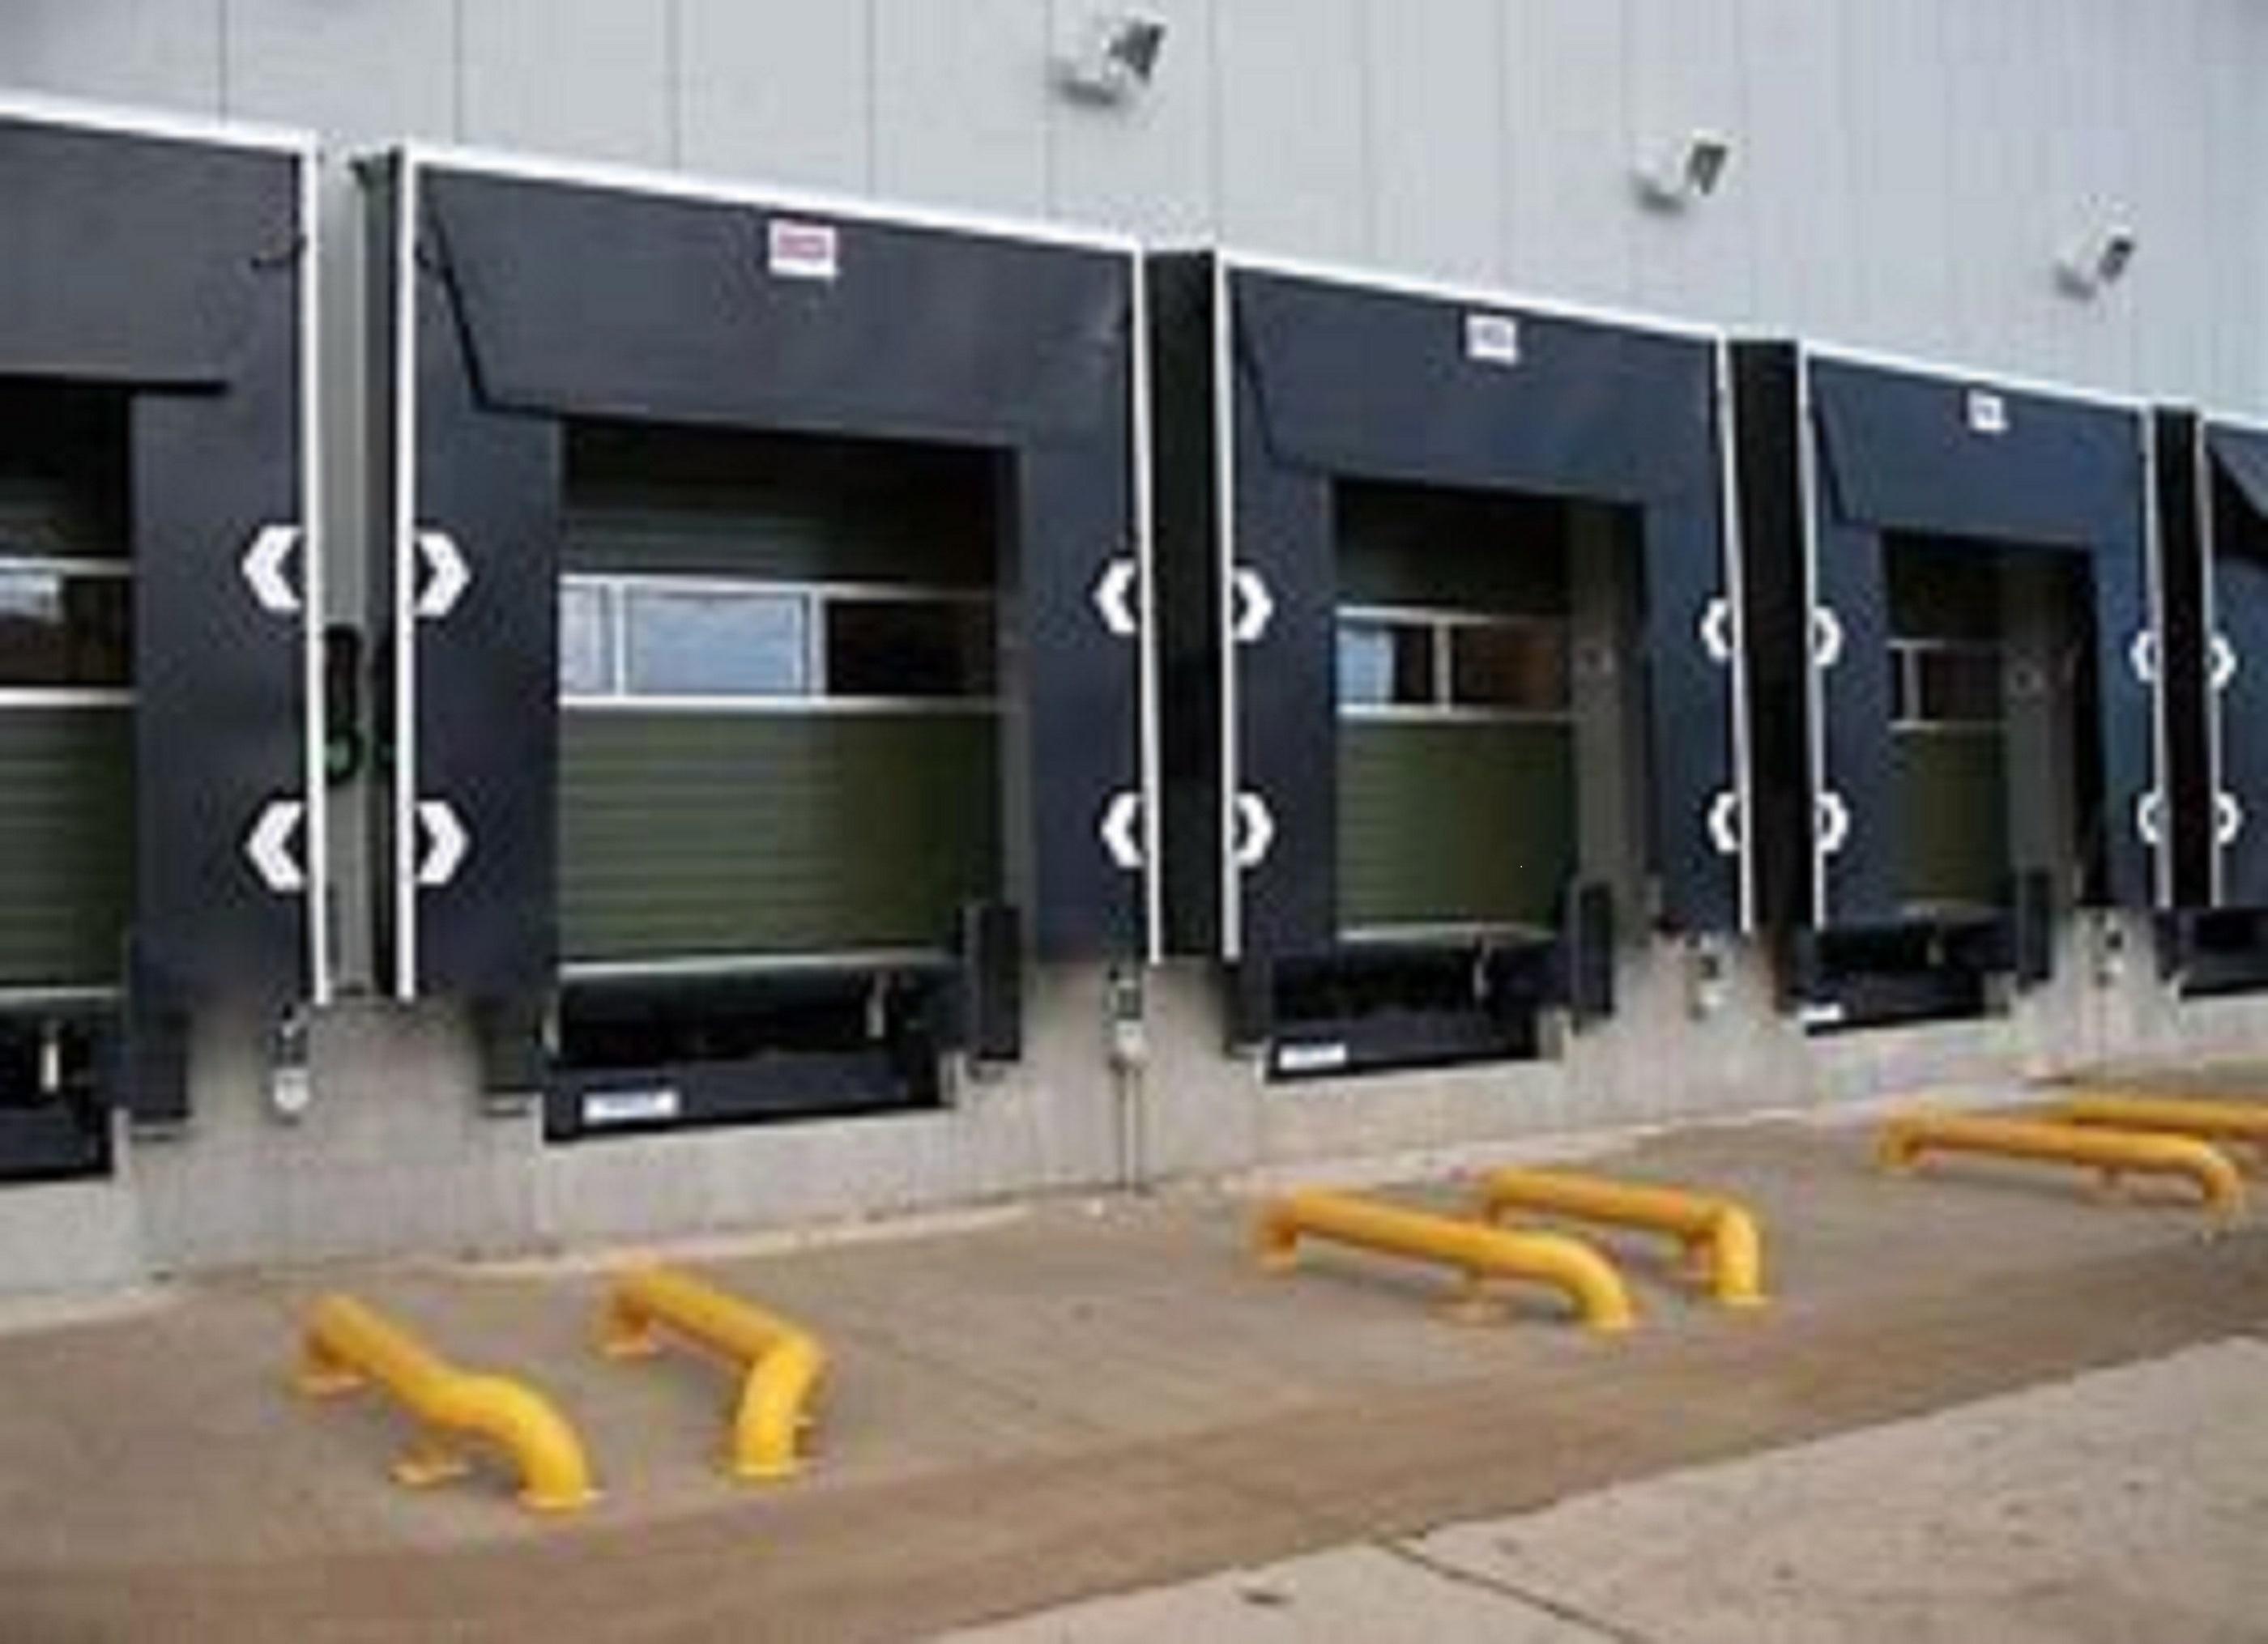 Te huur Logistiek Vastgoed – Rotterdam – 5.000 tot 20.000 m2